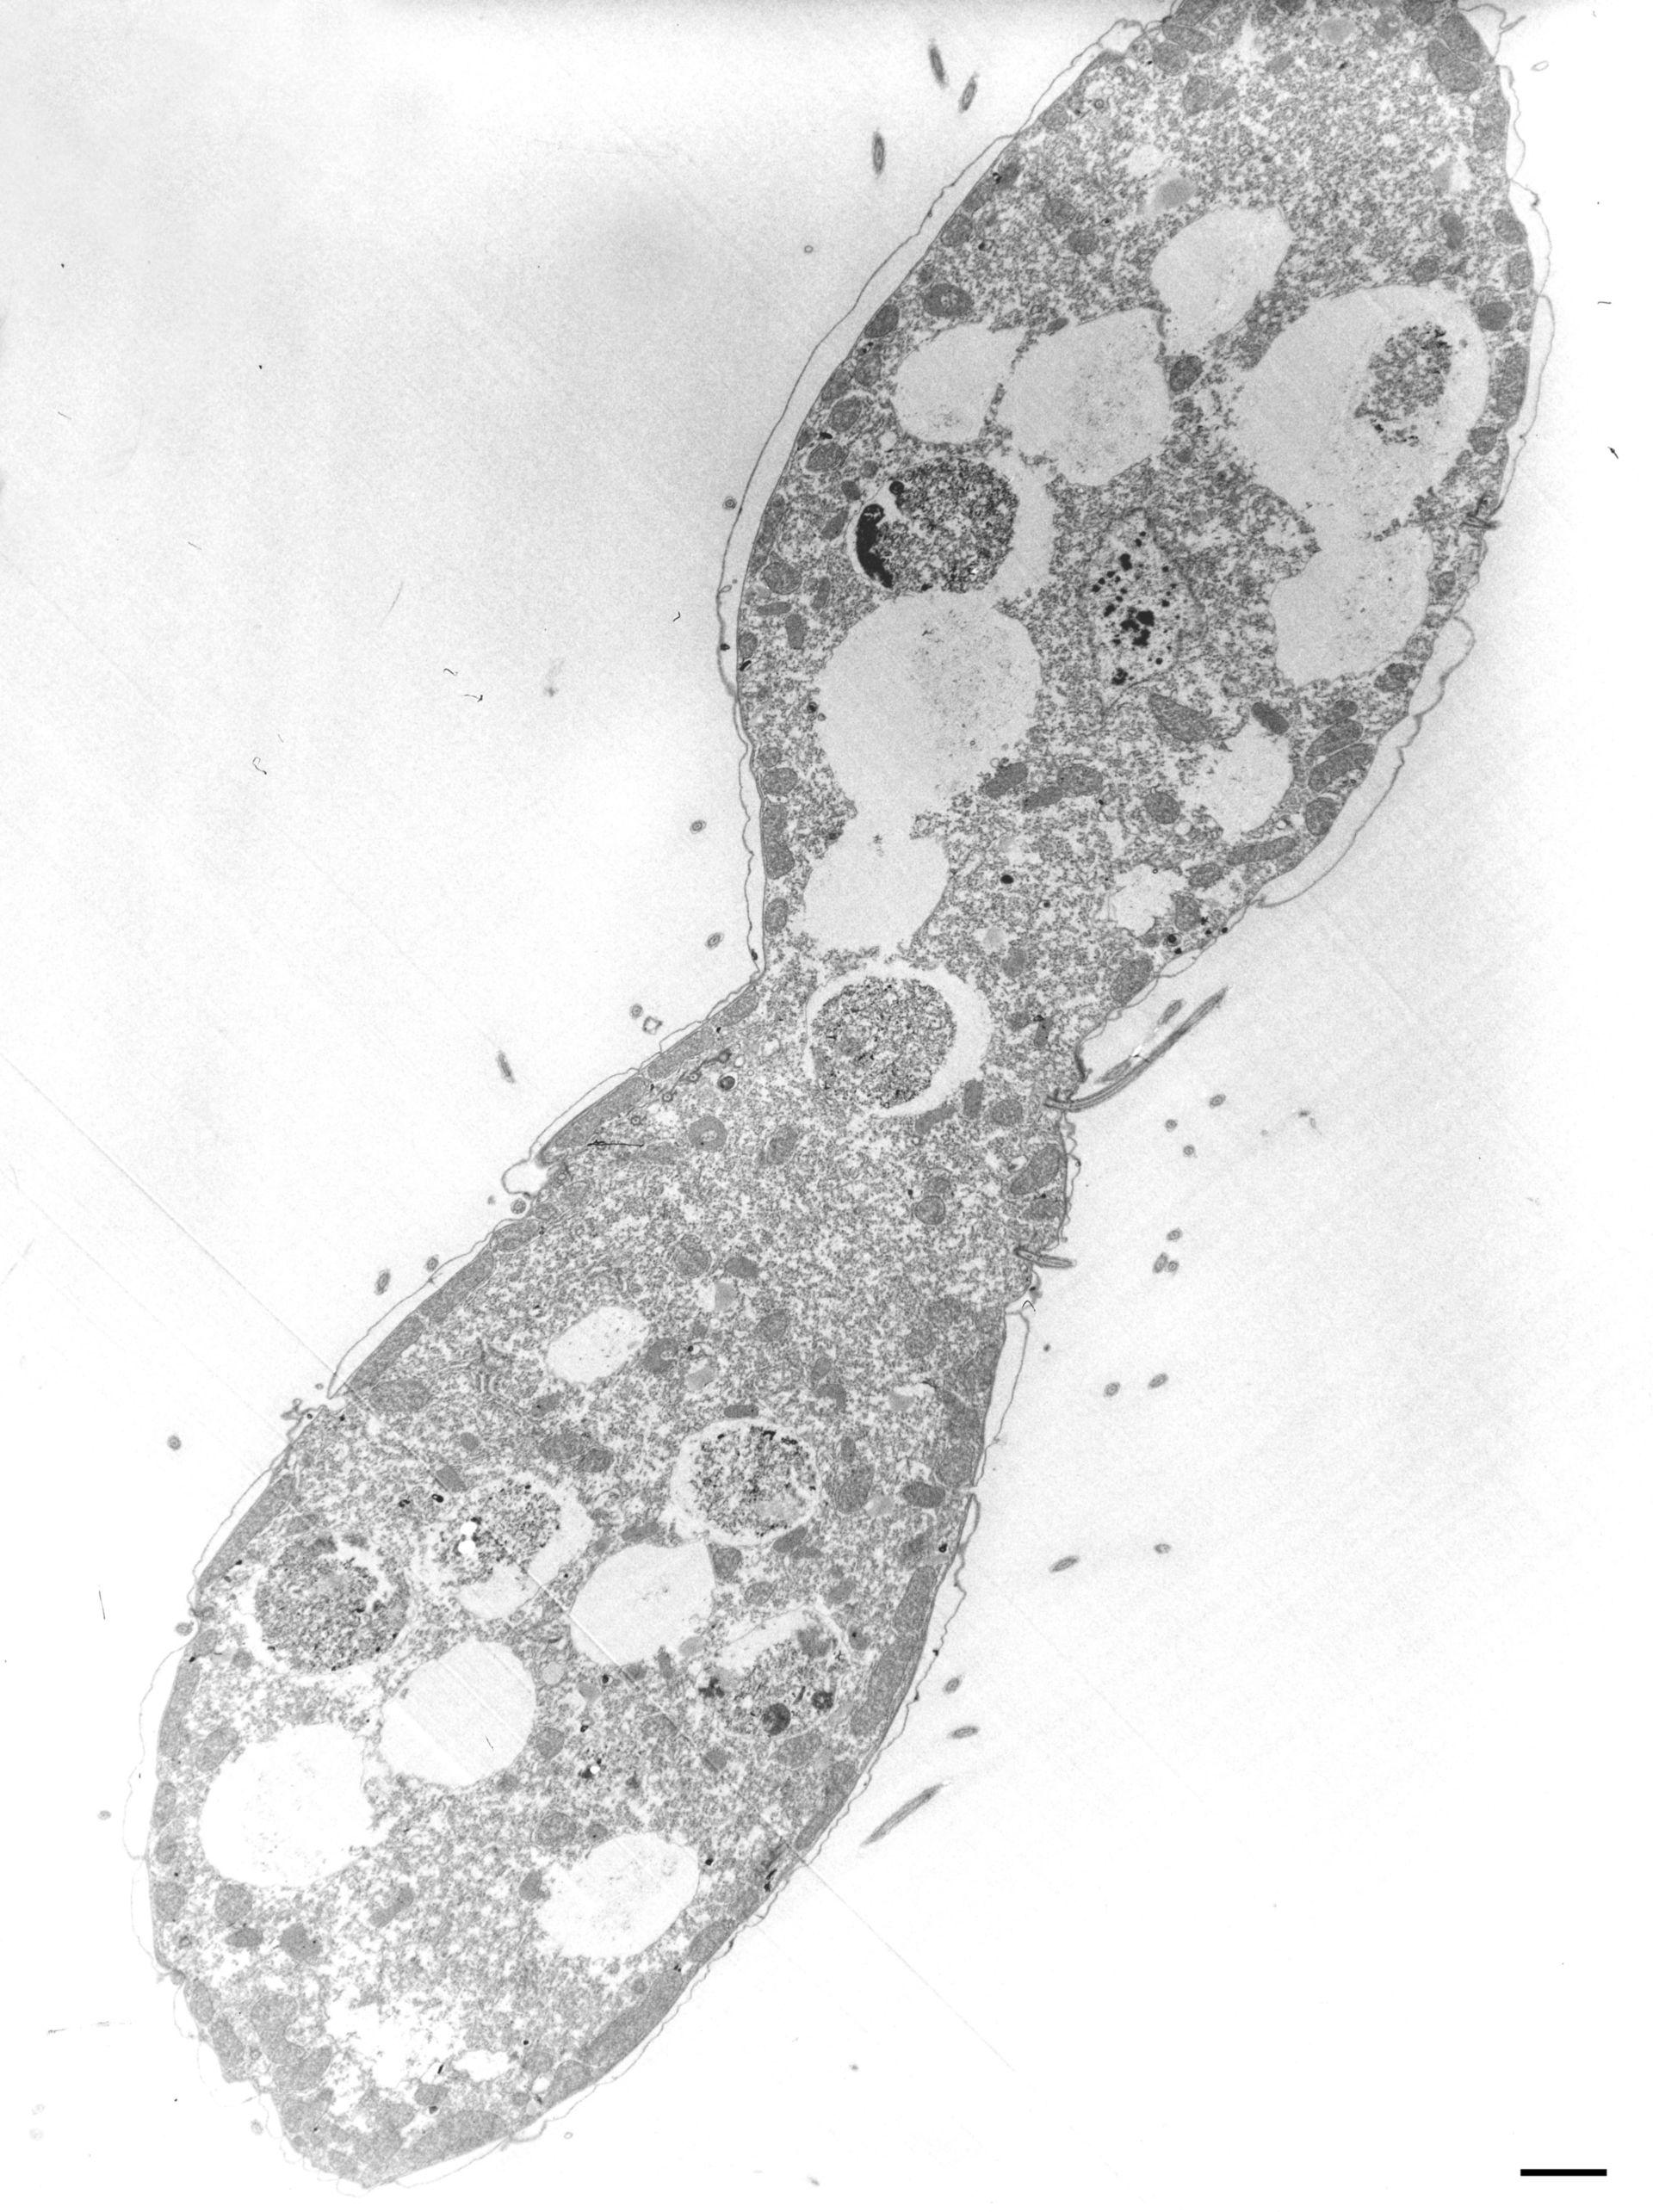 Tetrahymena pyriformis (Cell) - CIL:36240